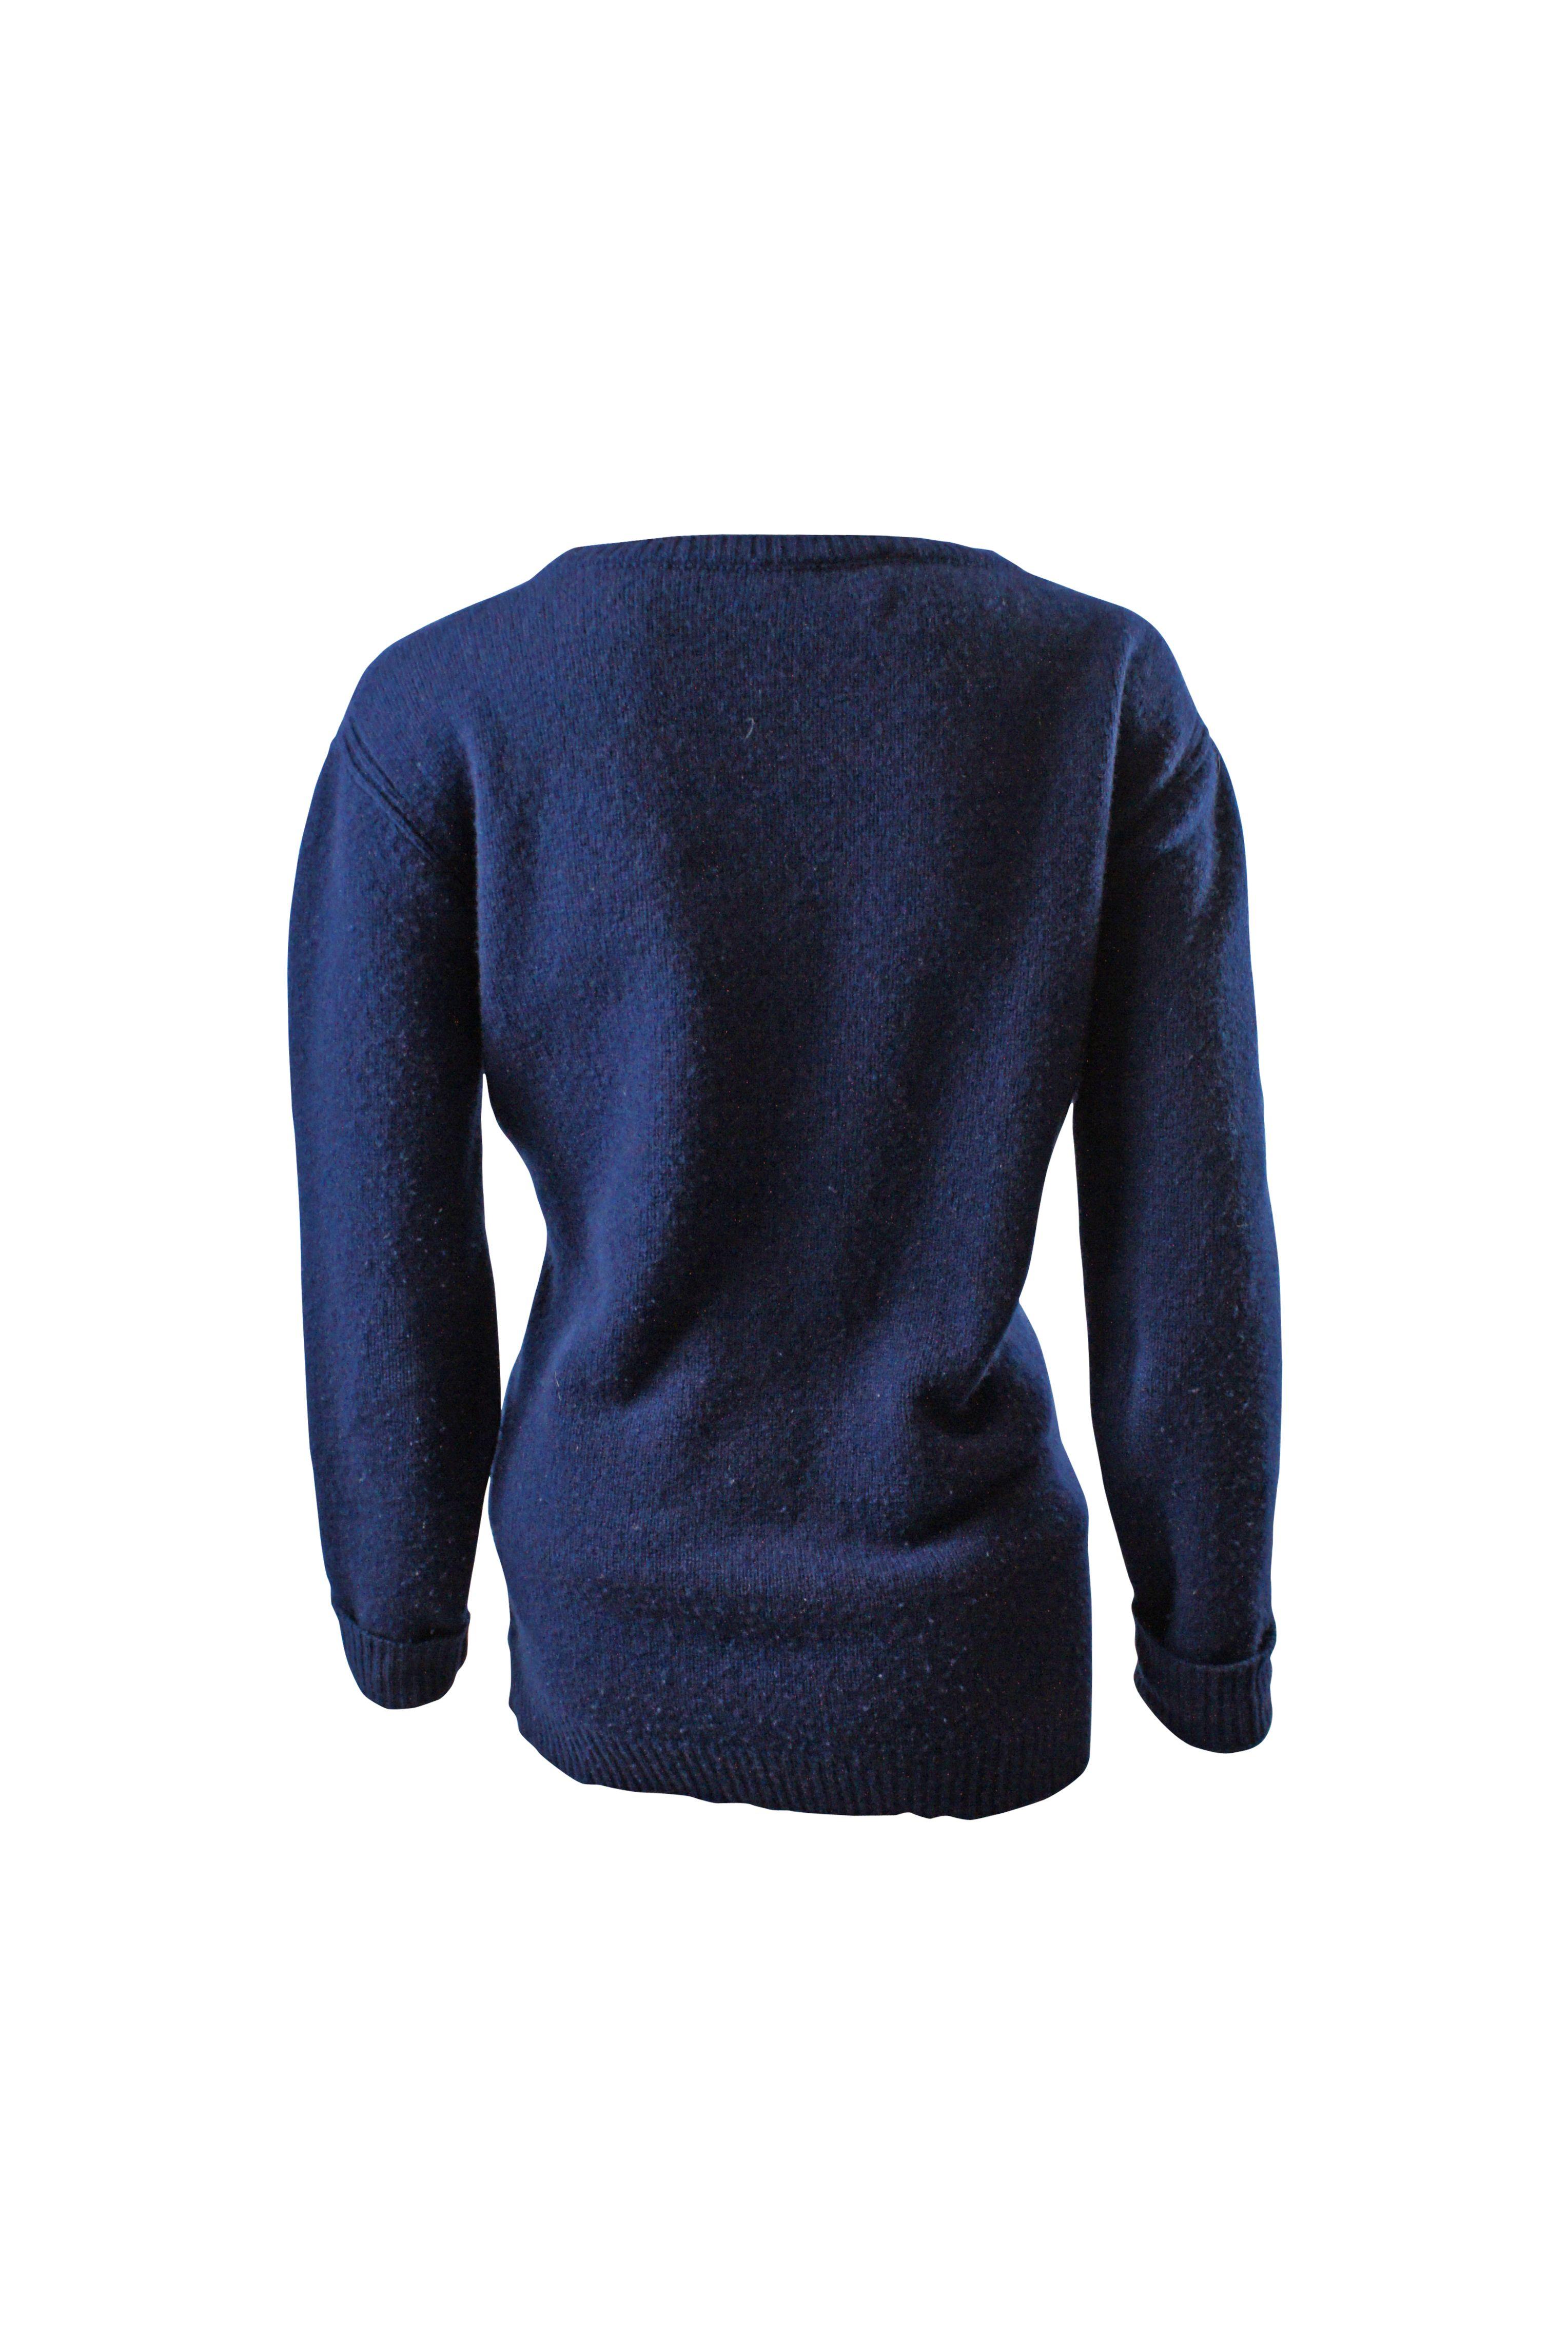 Alberta Ferretti Merino Wool And Cashmere 6 Preview Images